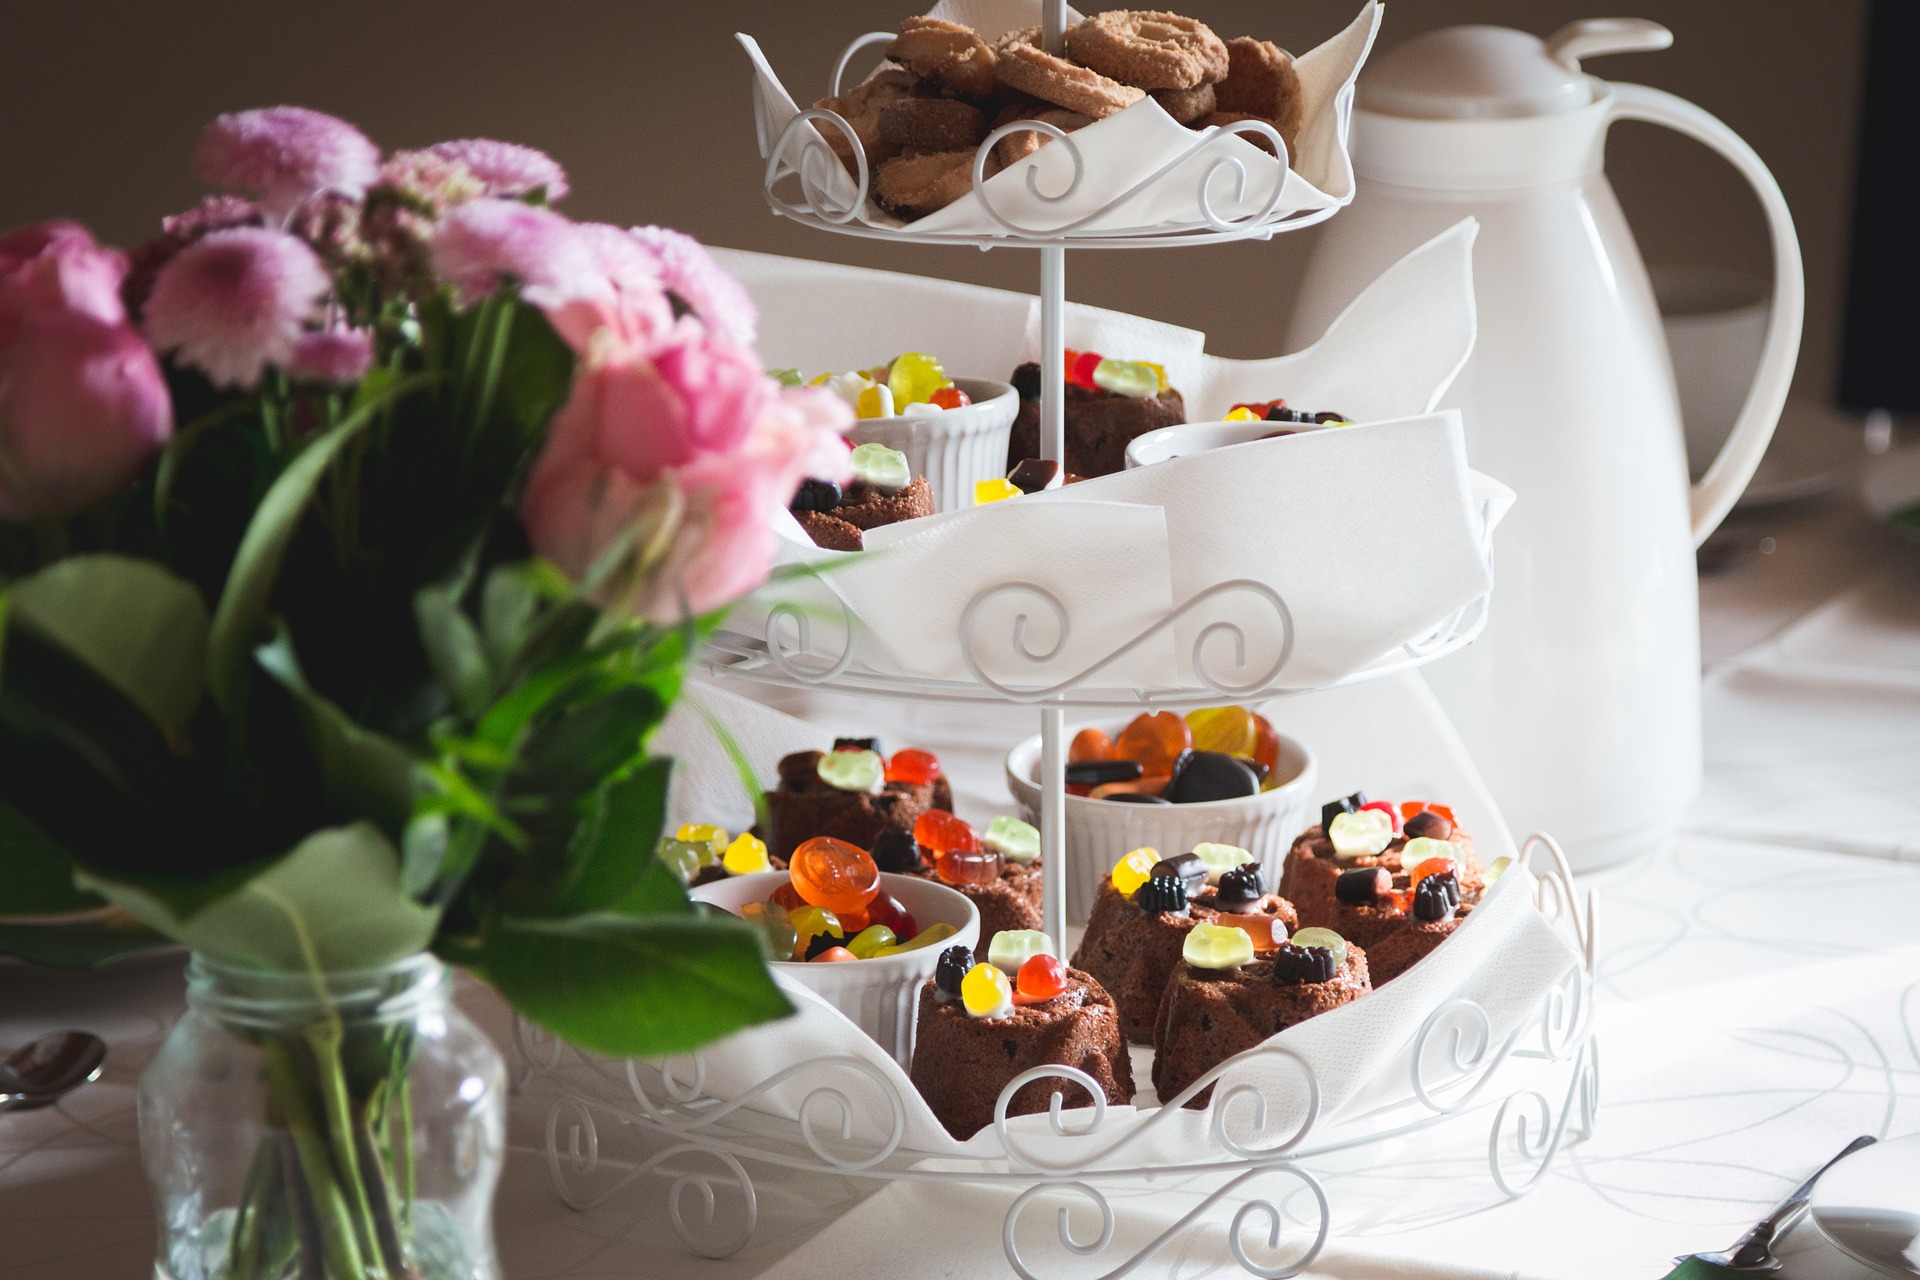 Member Breaks & Desserts